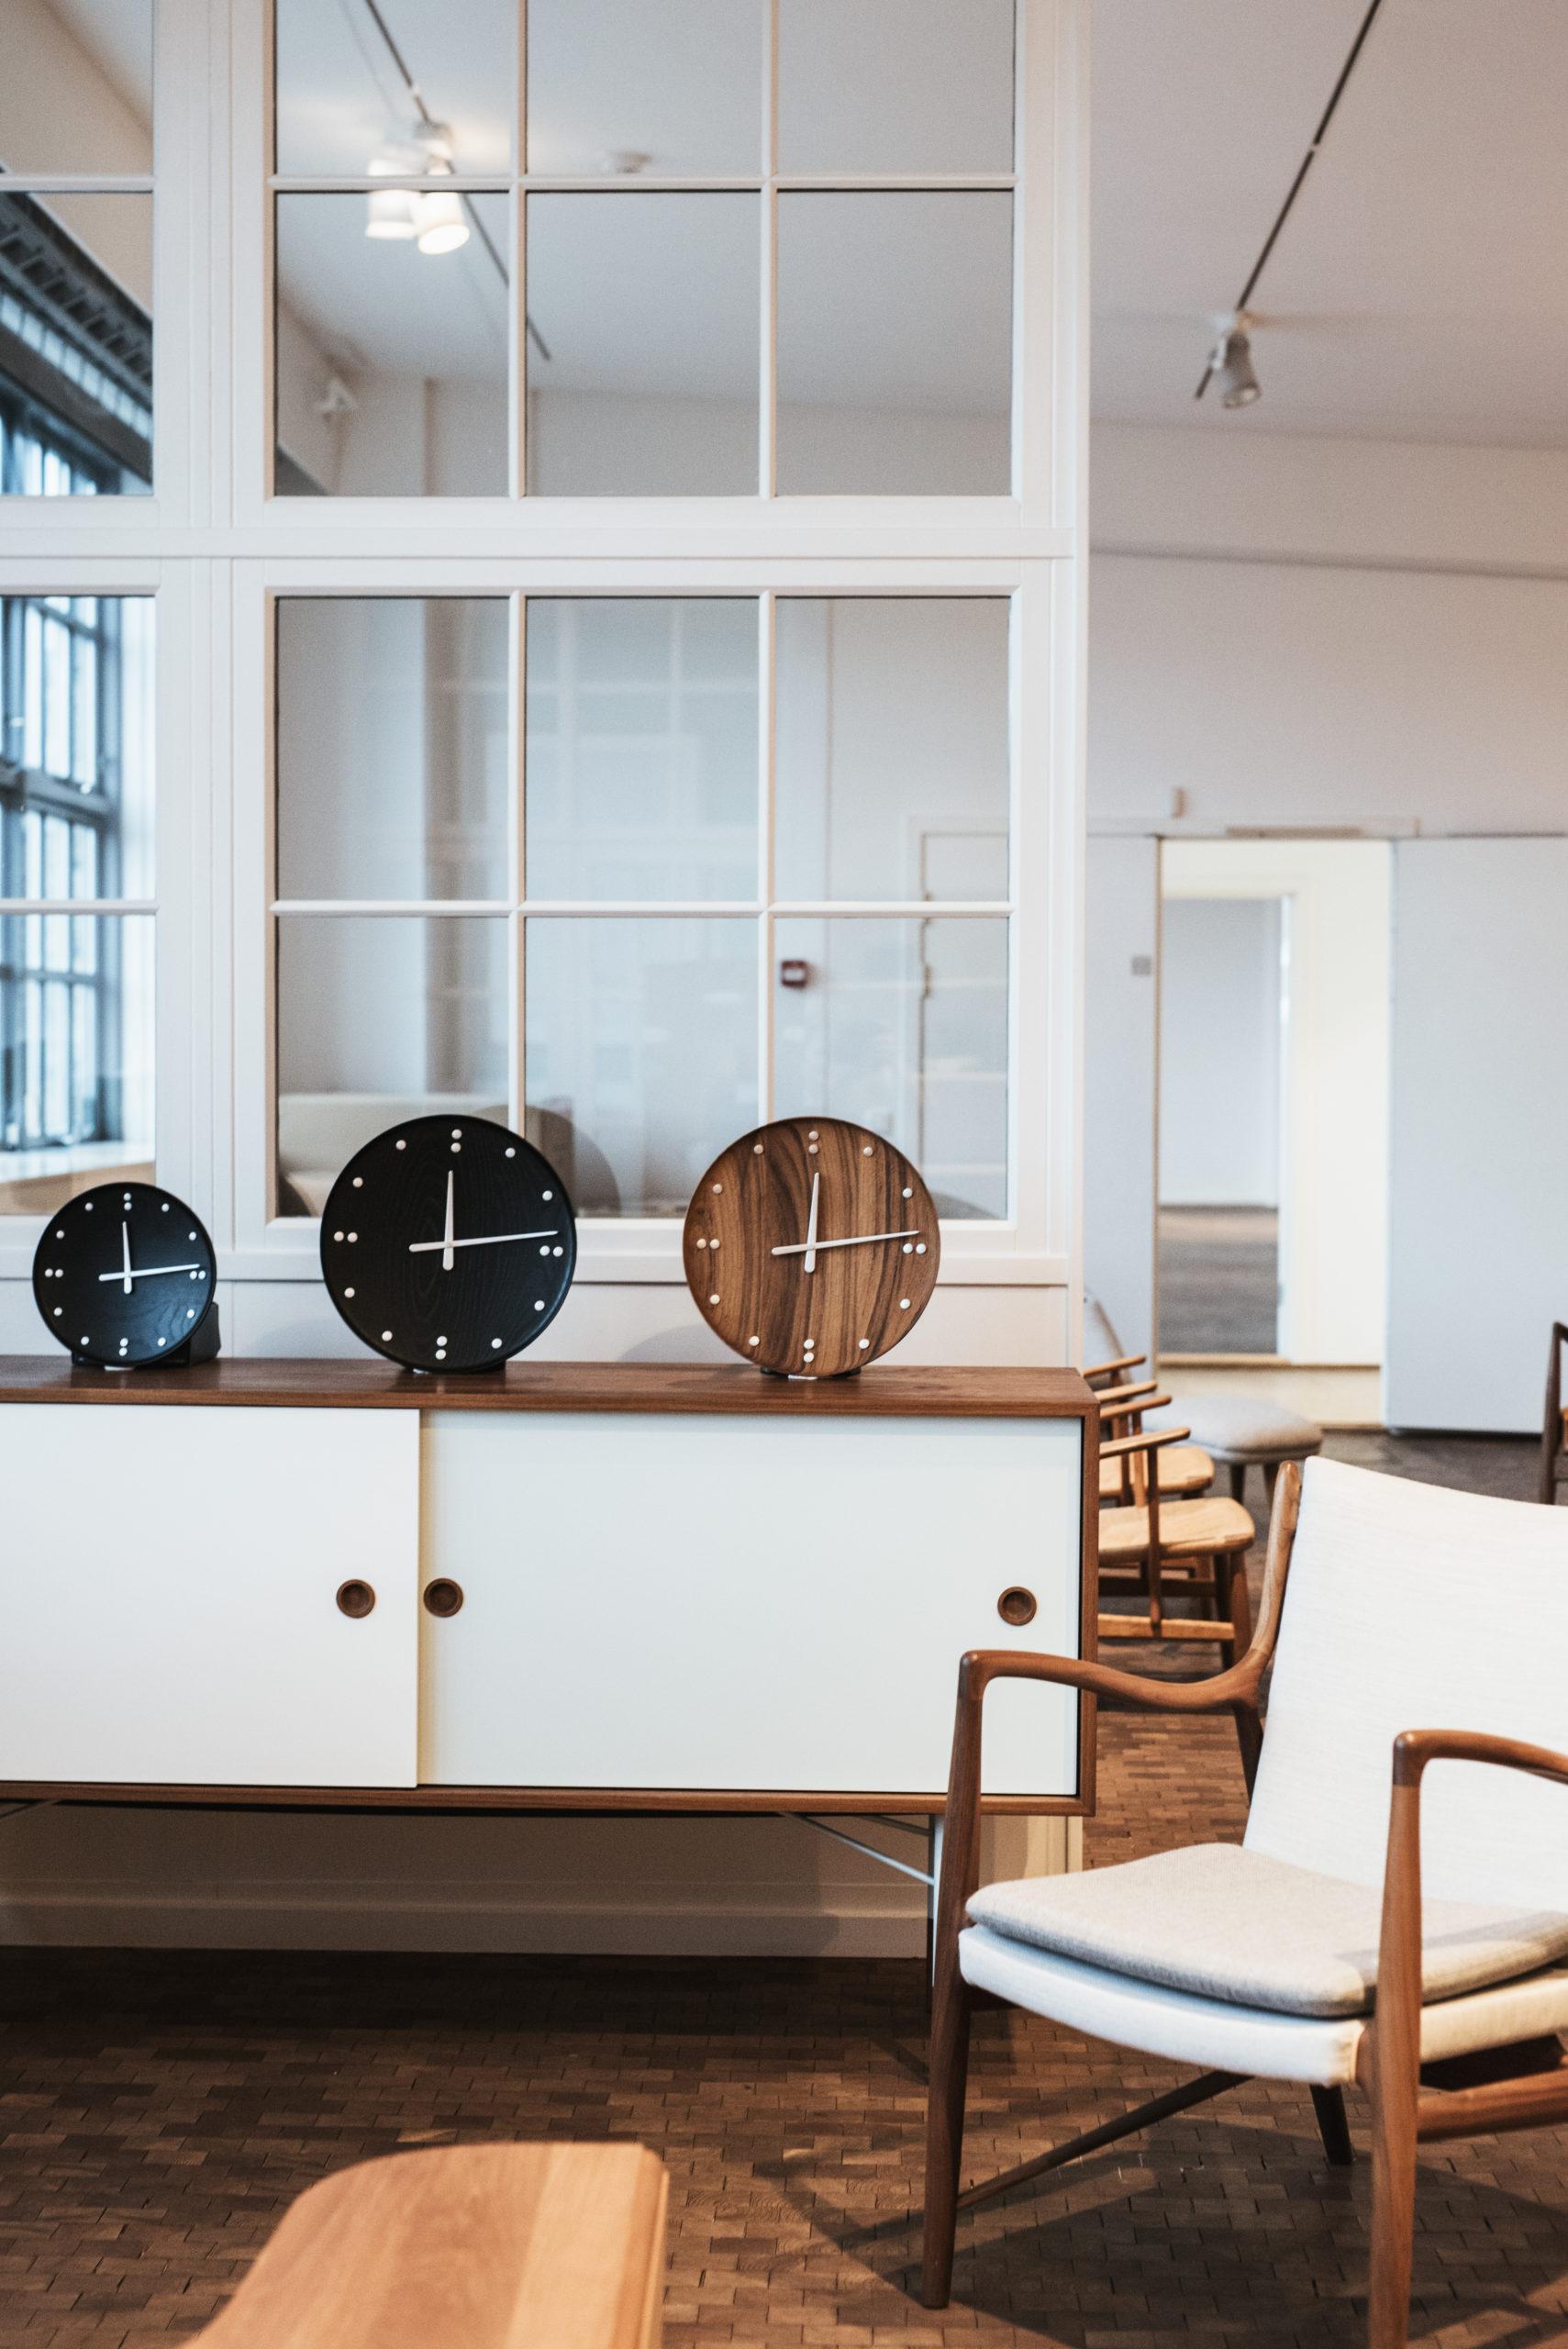 Architectmade-FJ-Clock-Wall-Clock-Teak-and-Ash-Wood-Denmark-Finn-Juhl-2